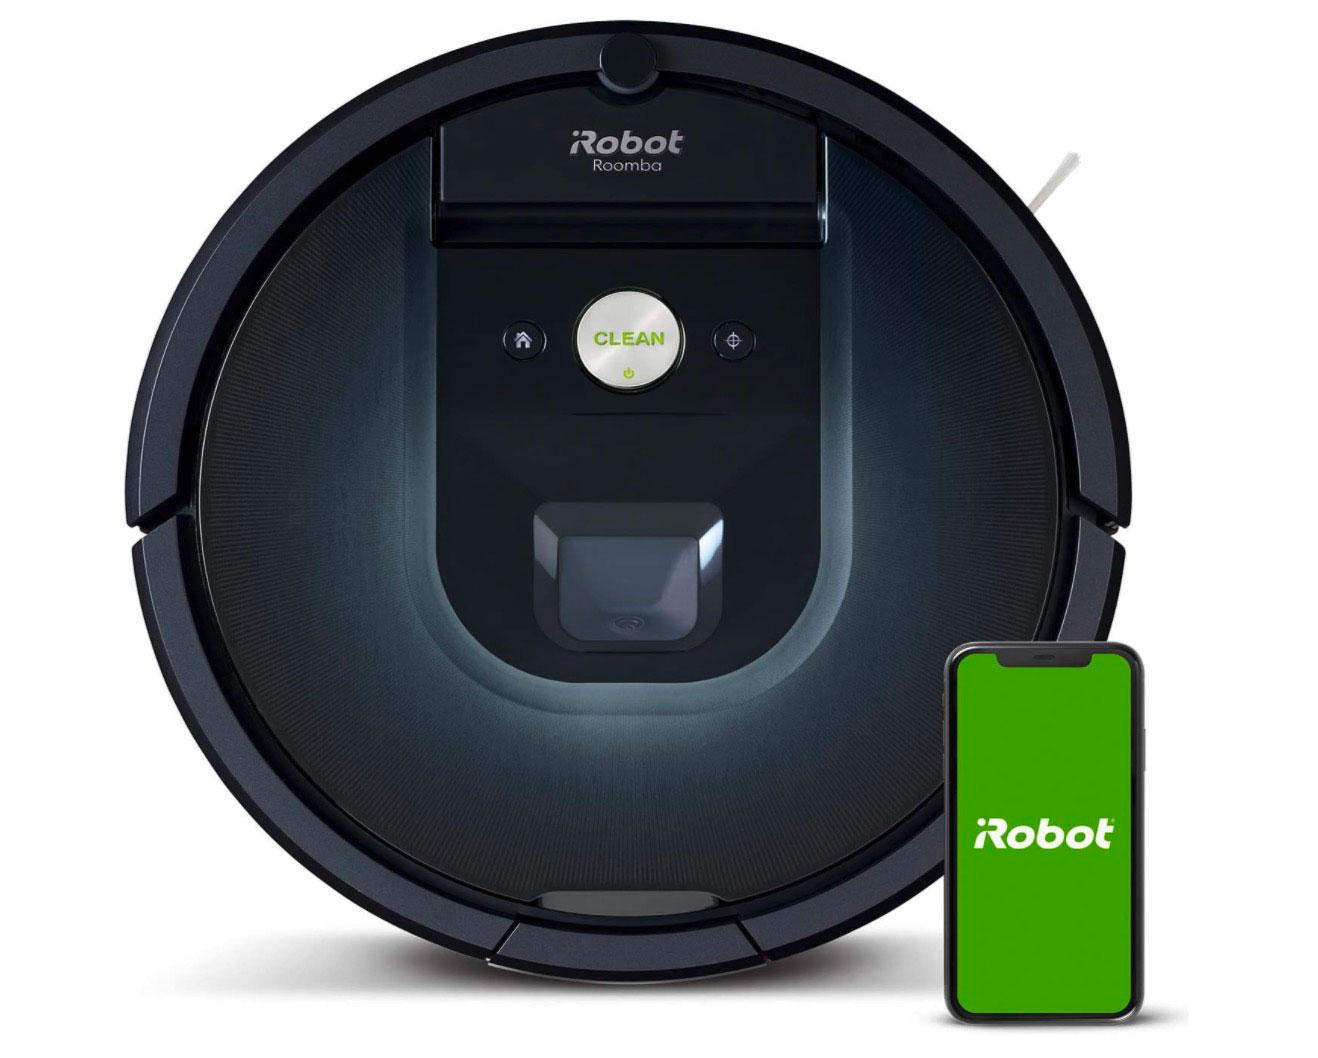 L'iRobot Roomba 981 est en promo chez Amazon